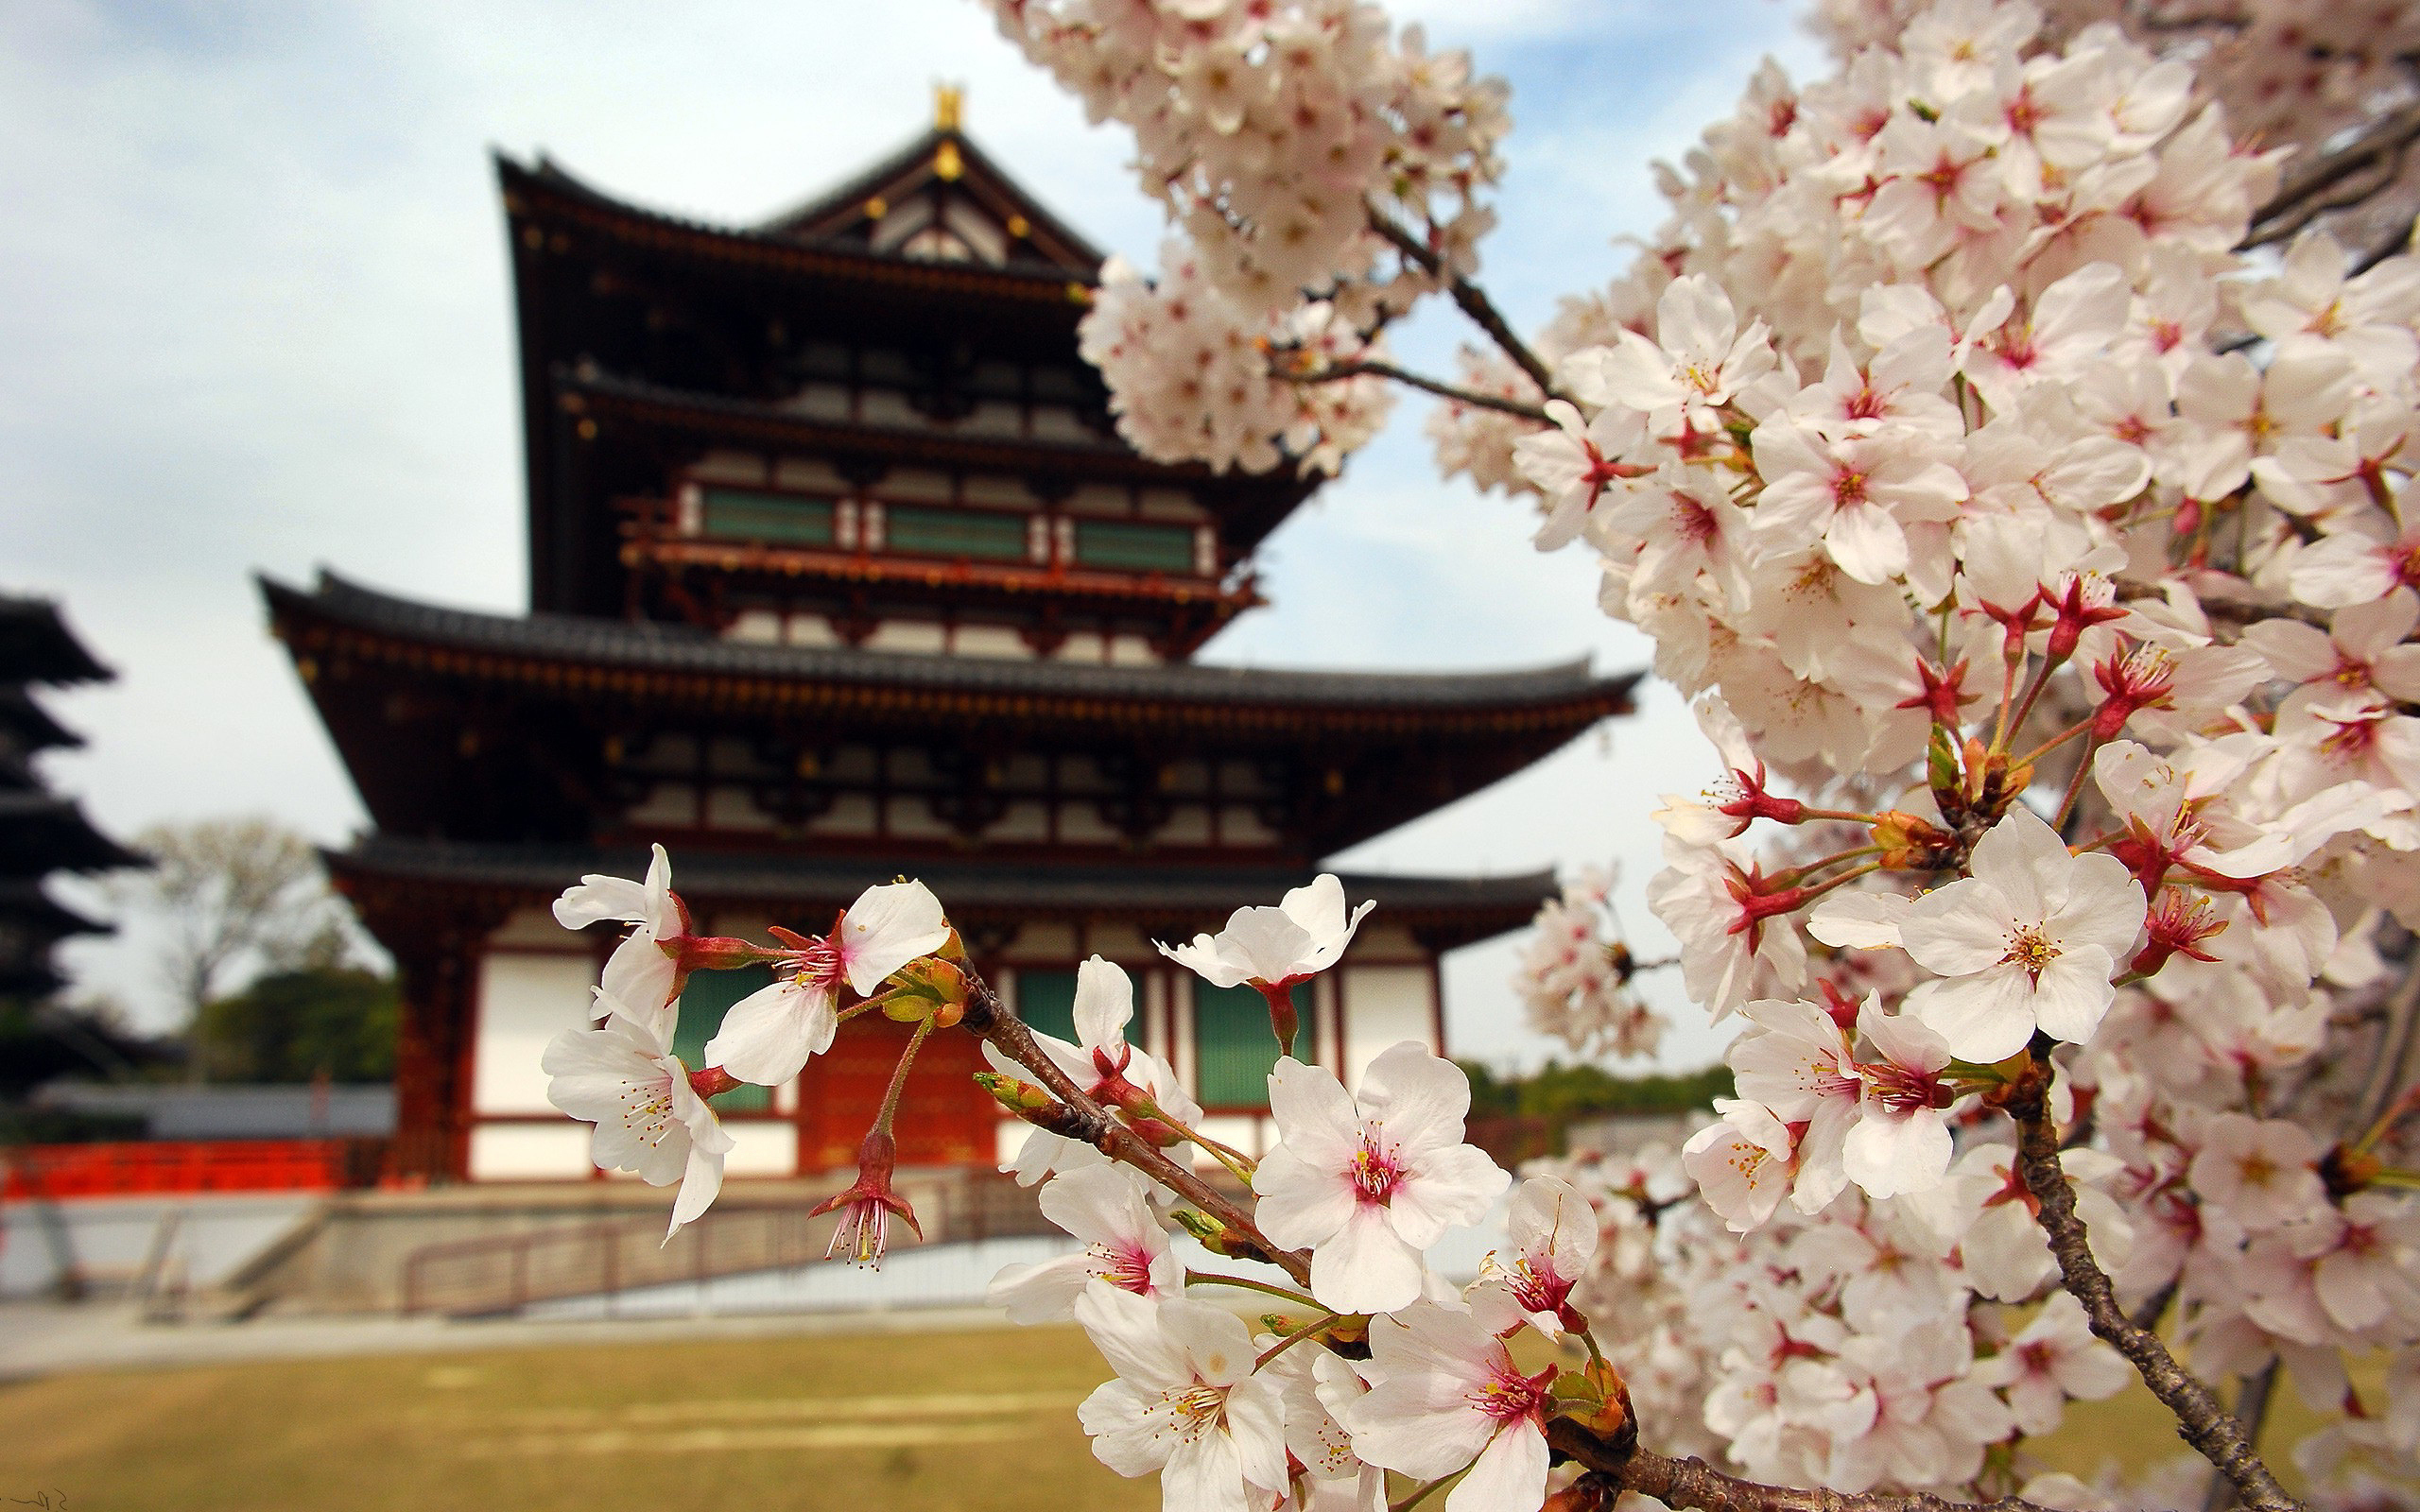 Du lịch Nhật Bản: KYOTO - OSAKA – HIROSHIMA - OKAYAMA 6 ngày